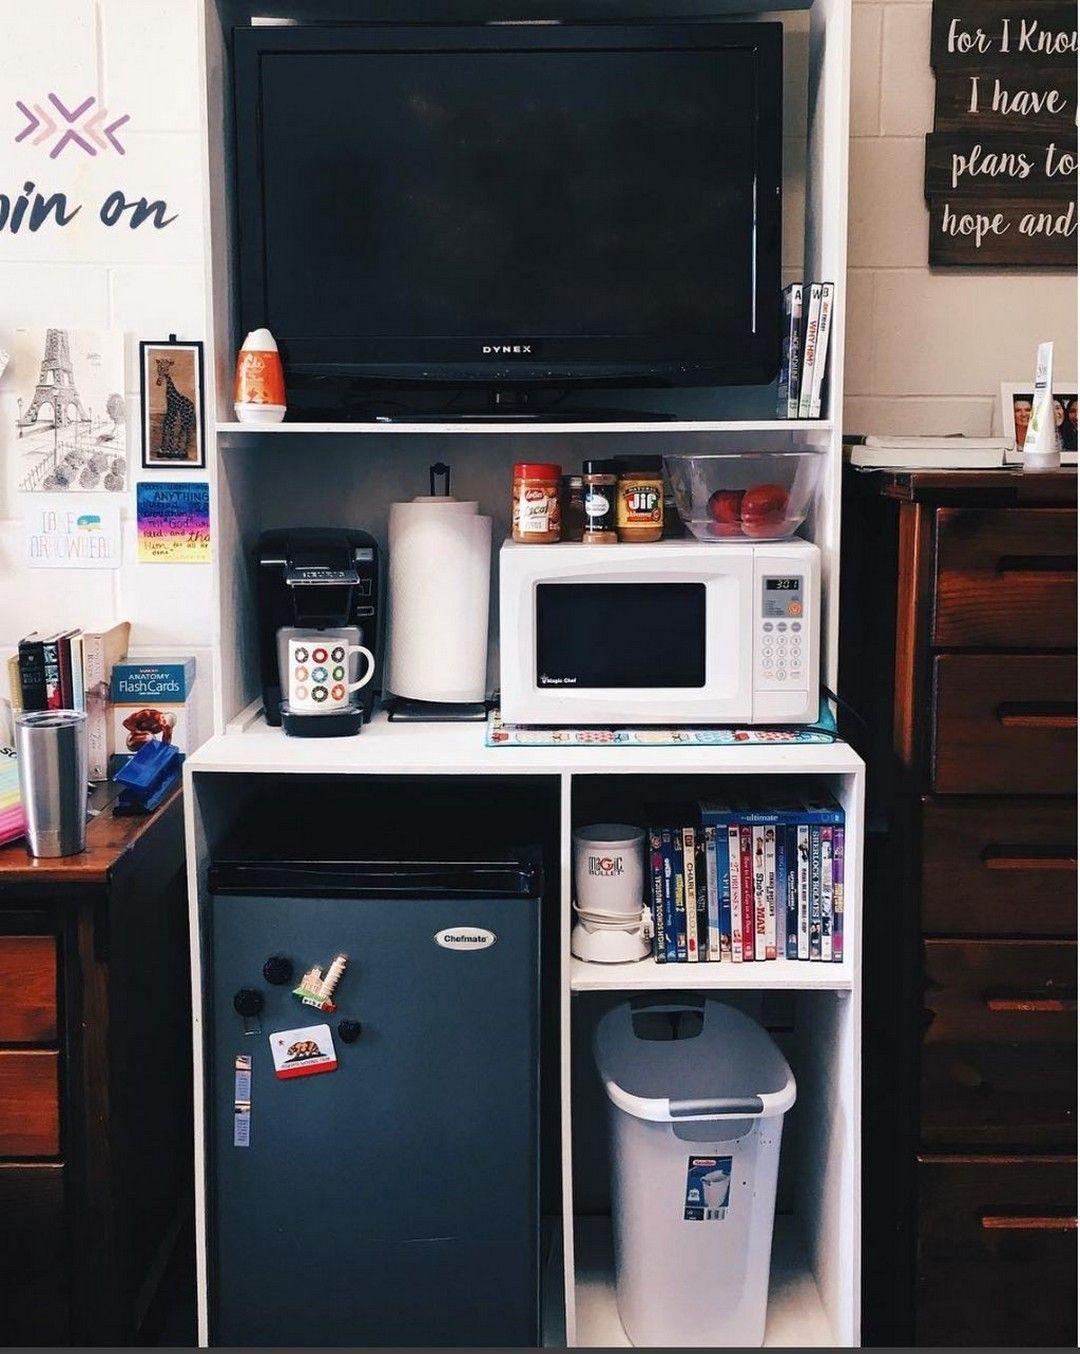 Cool 12+ Brilliant Dorm Room Organization Ideas On A Budget #collegedormroomideas